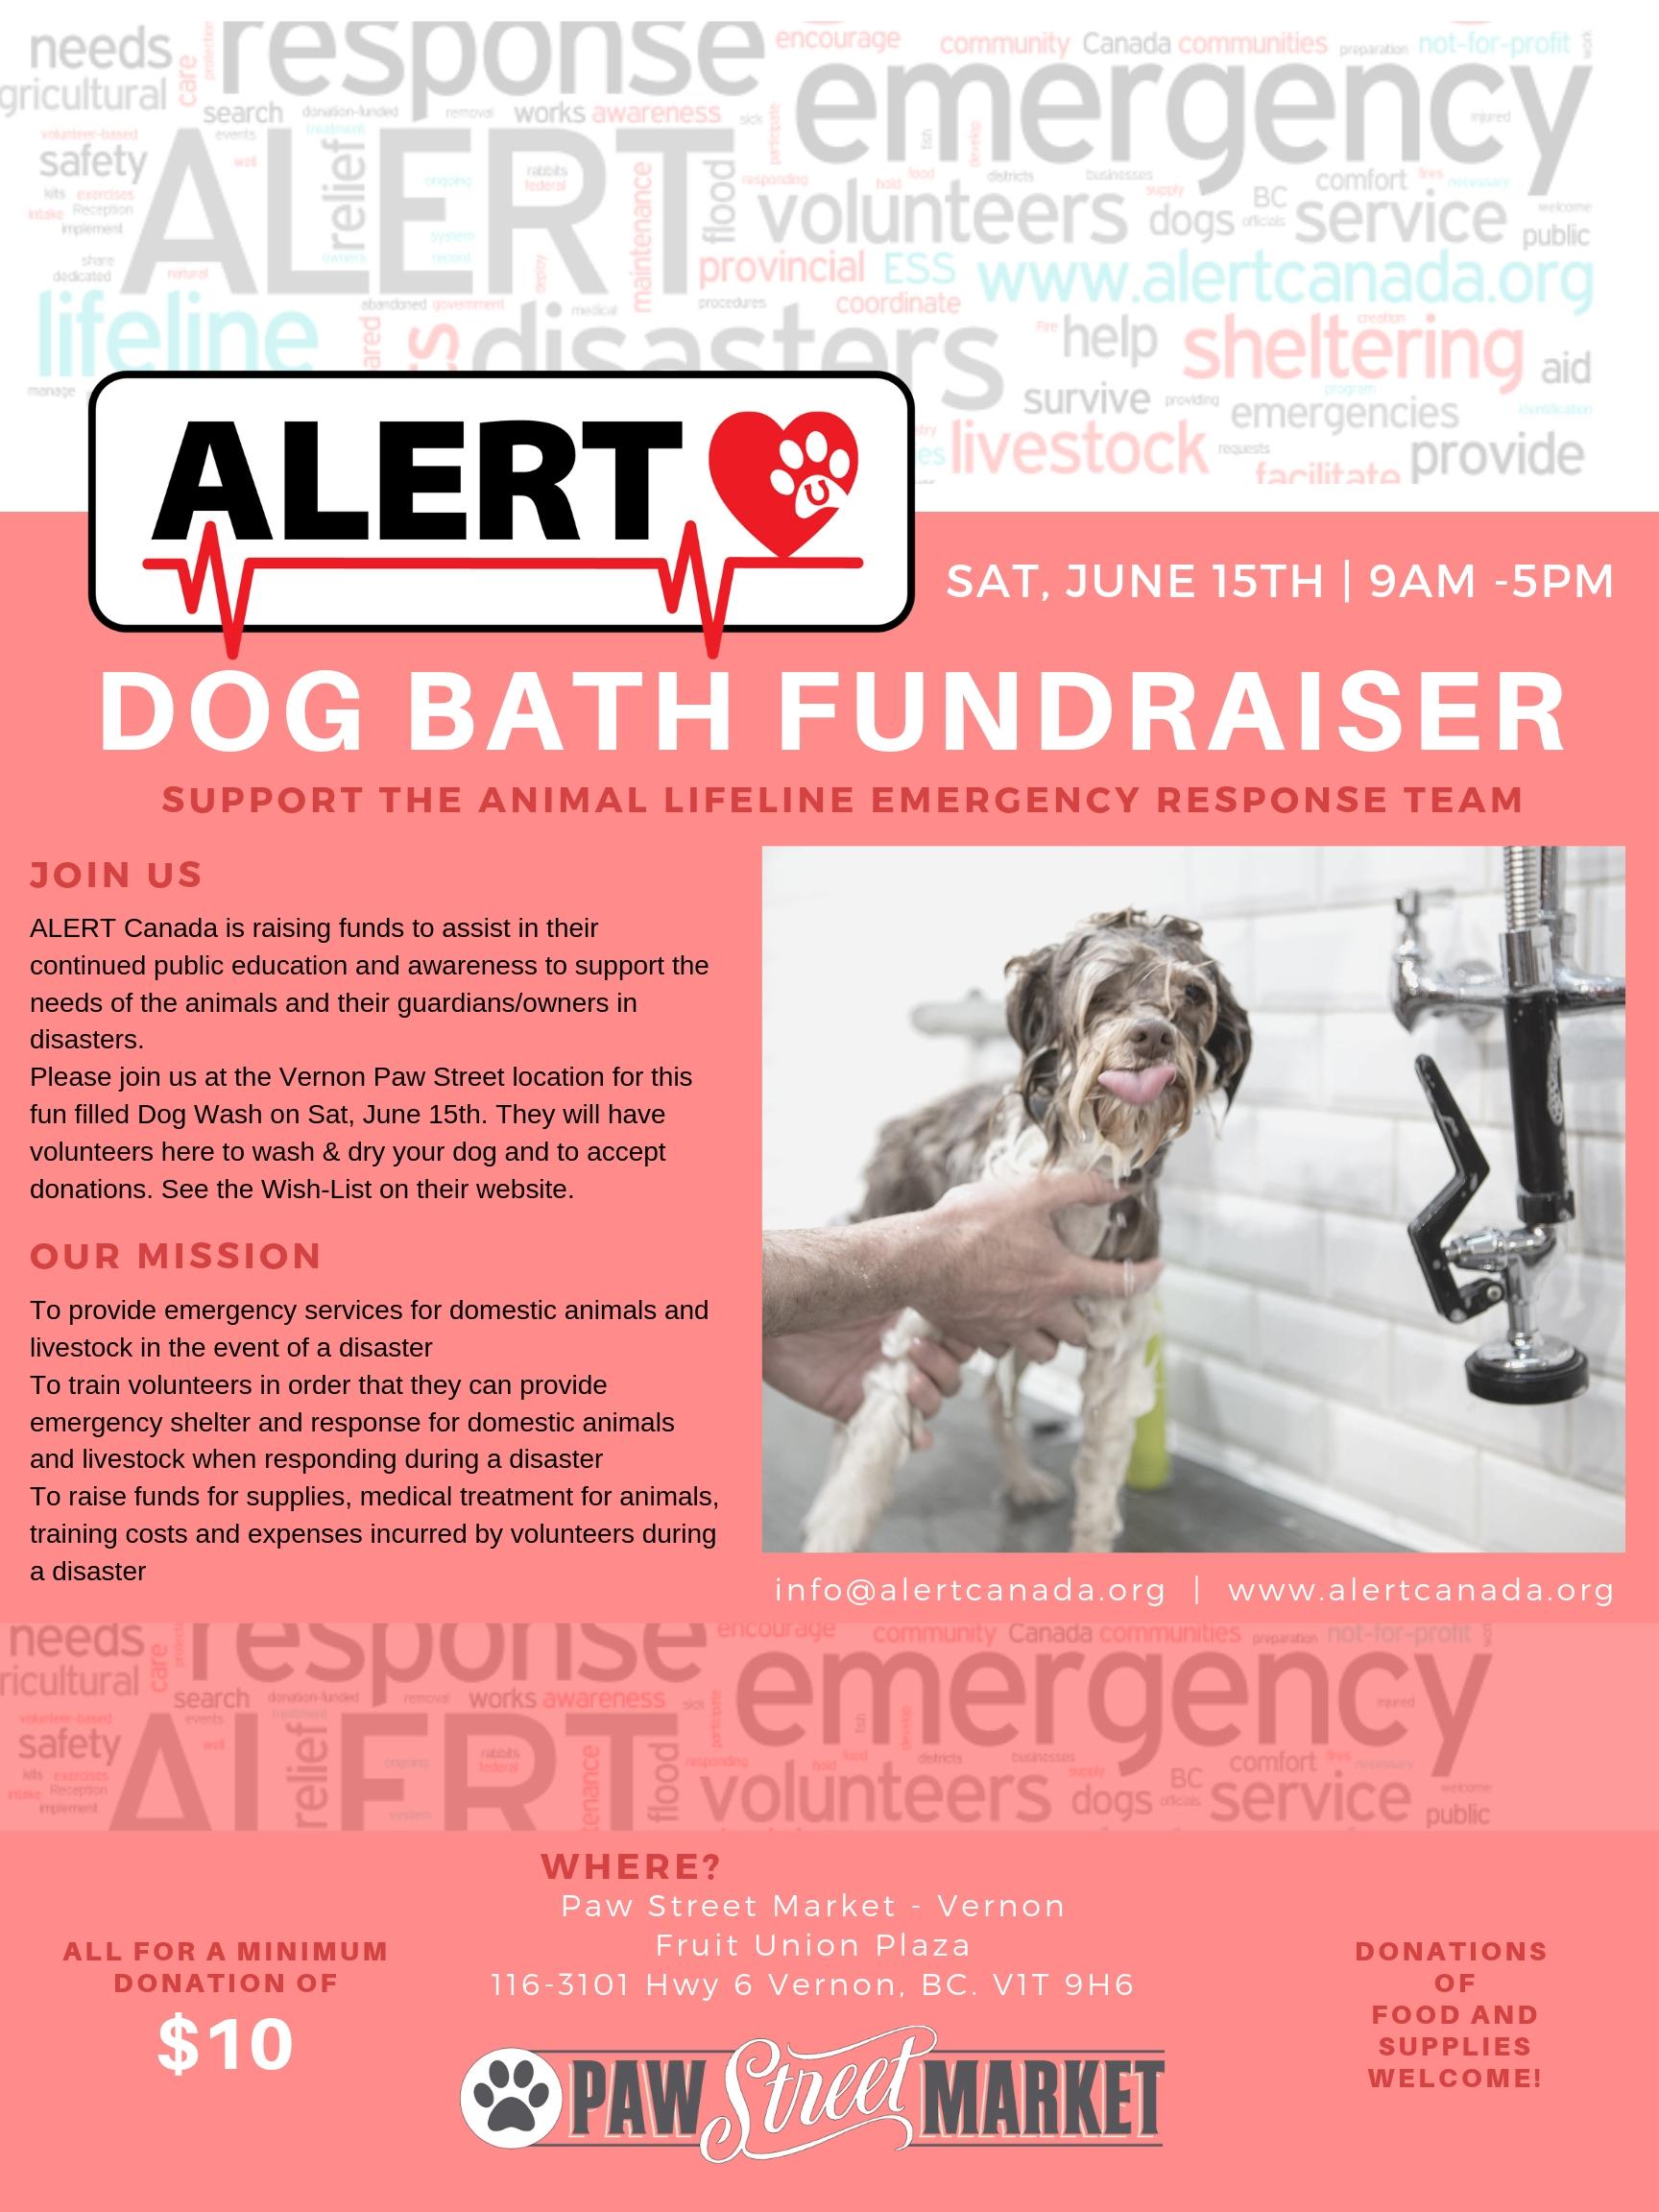 Alert Canada Poster Fundraiser.jpg